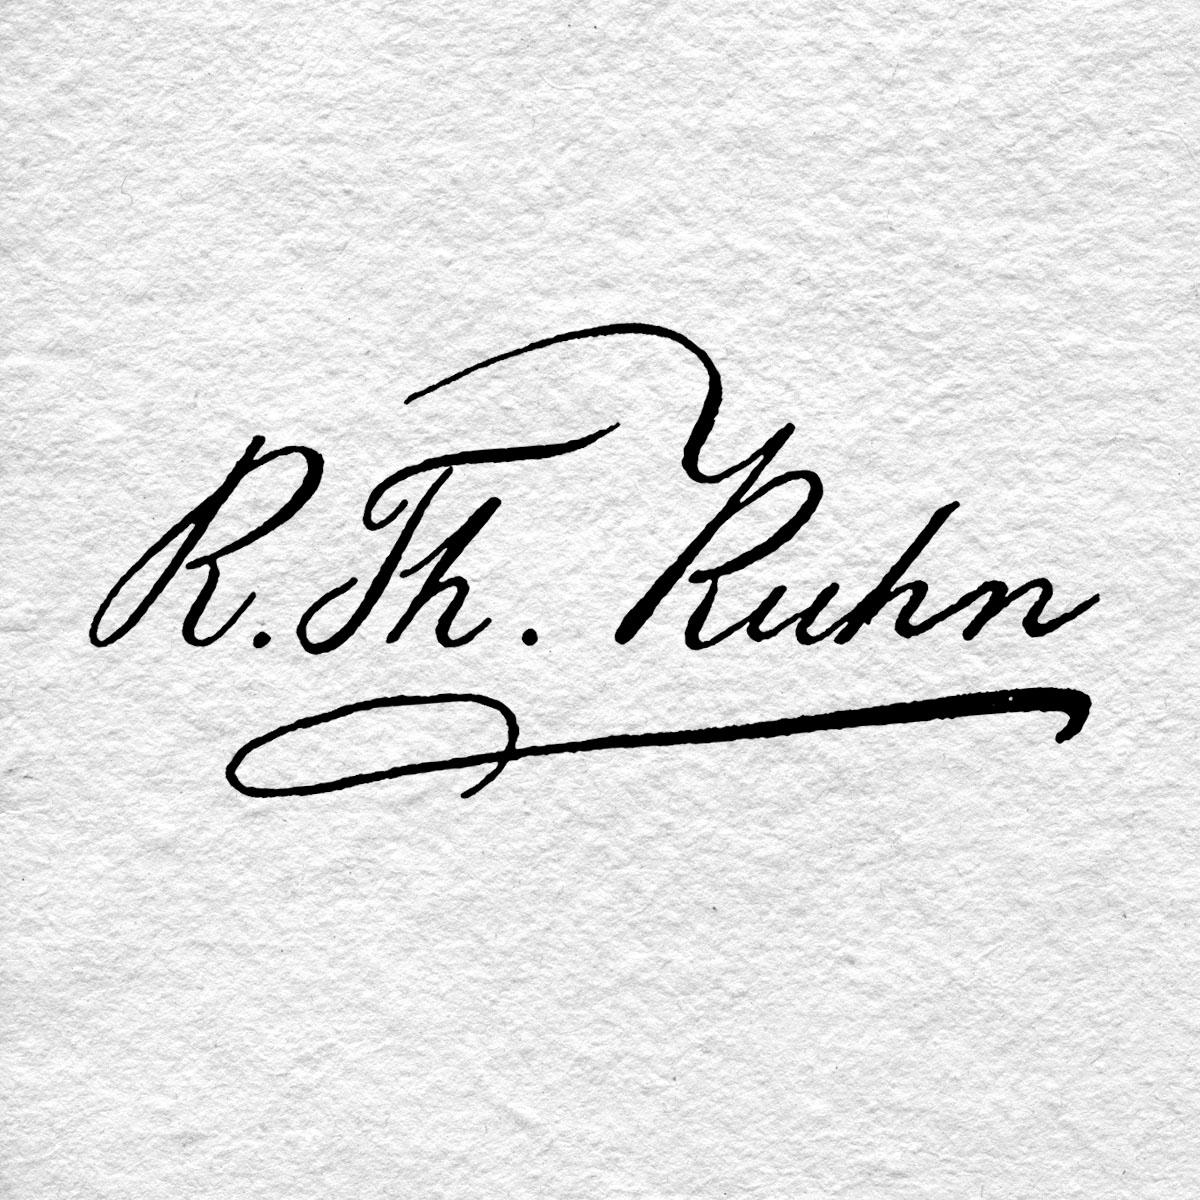 Rudolf Th. Kuhn - oficjalne logo